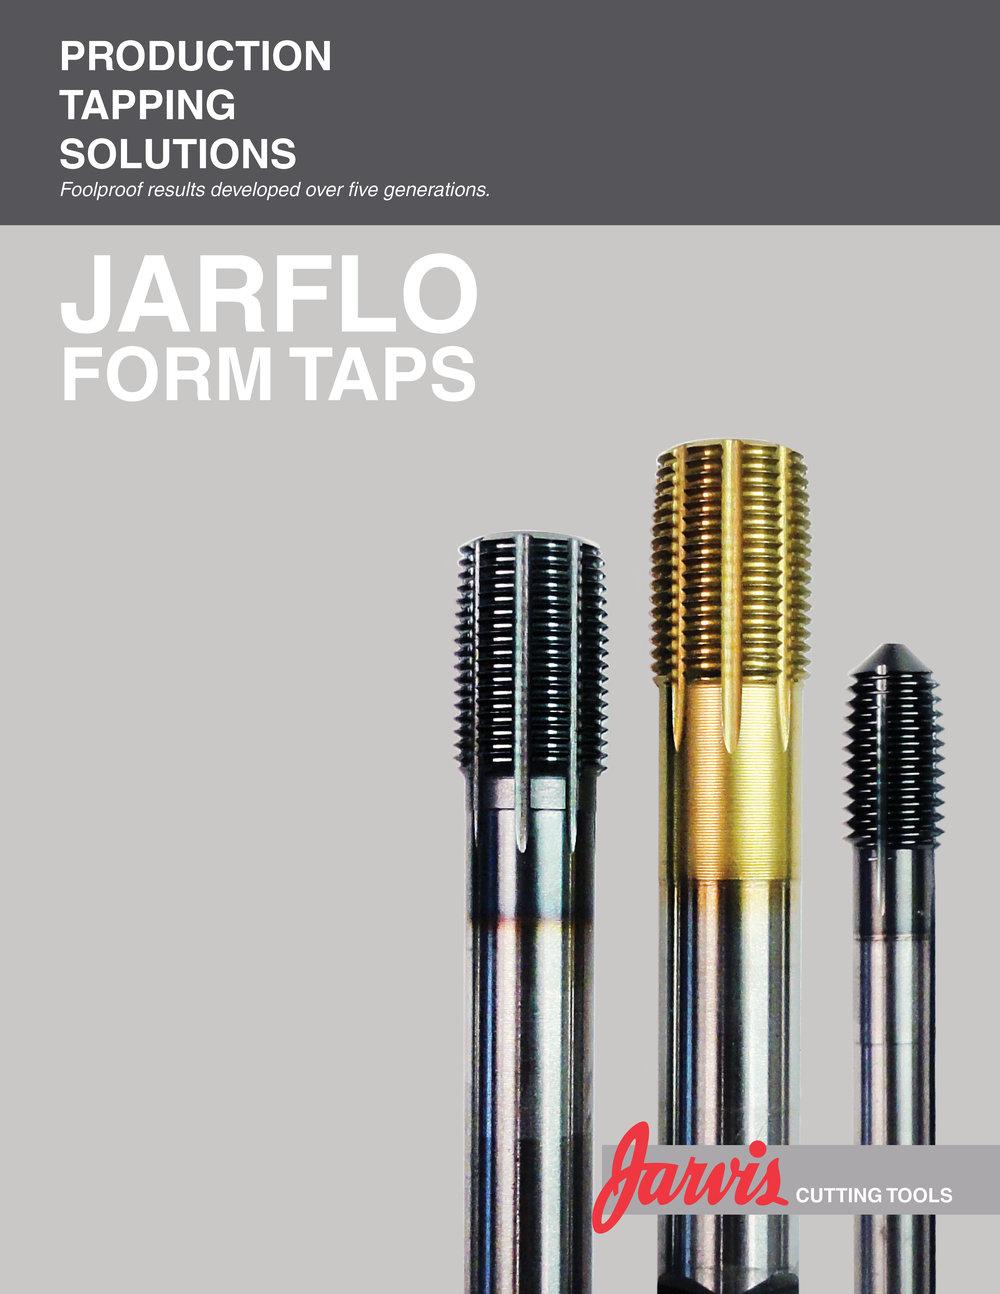 Jarflo Form Taps 2017.jpg